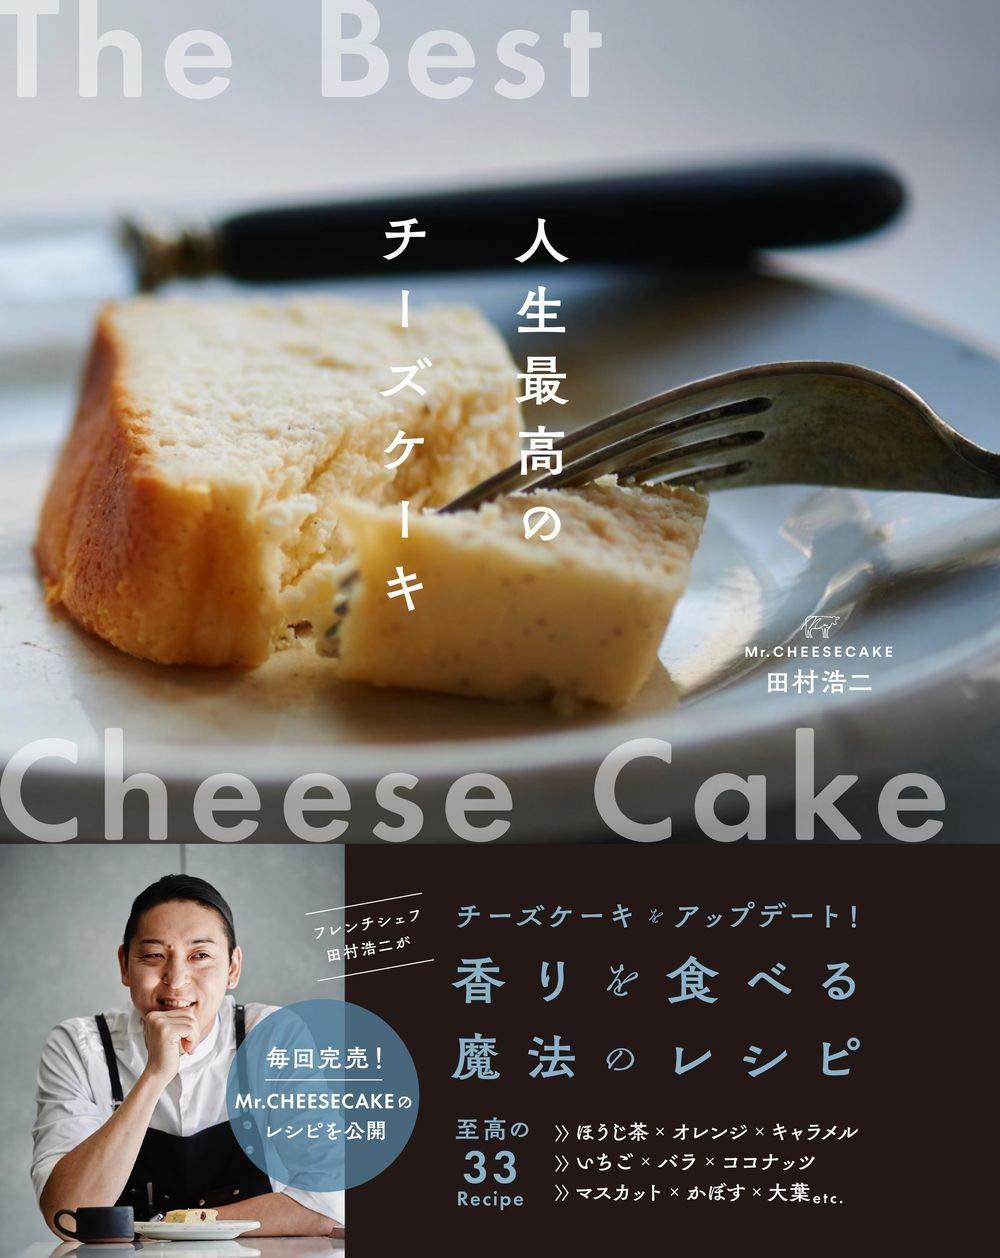 Mr.CHEESECAKE田村浩二 人生最高のチーズケーキ